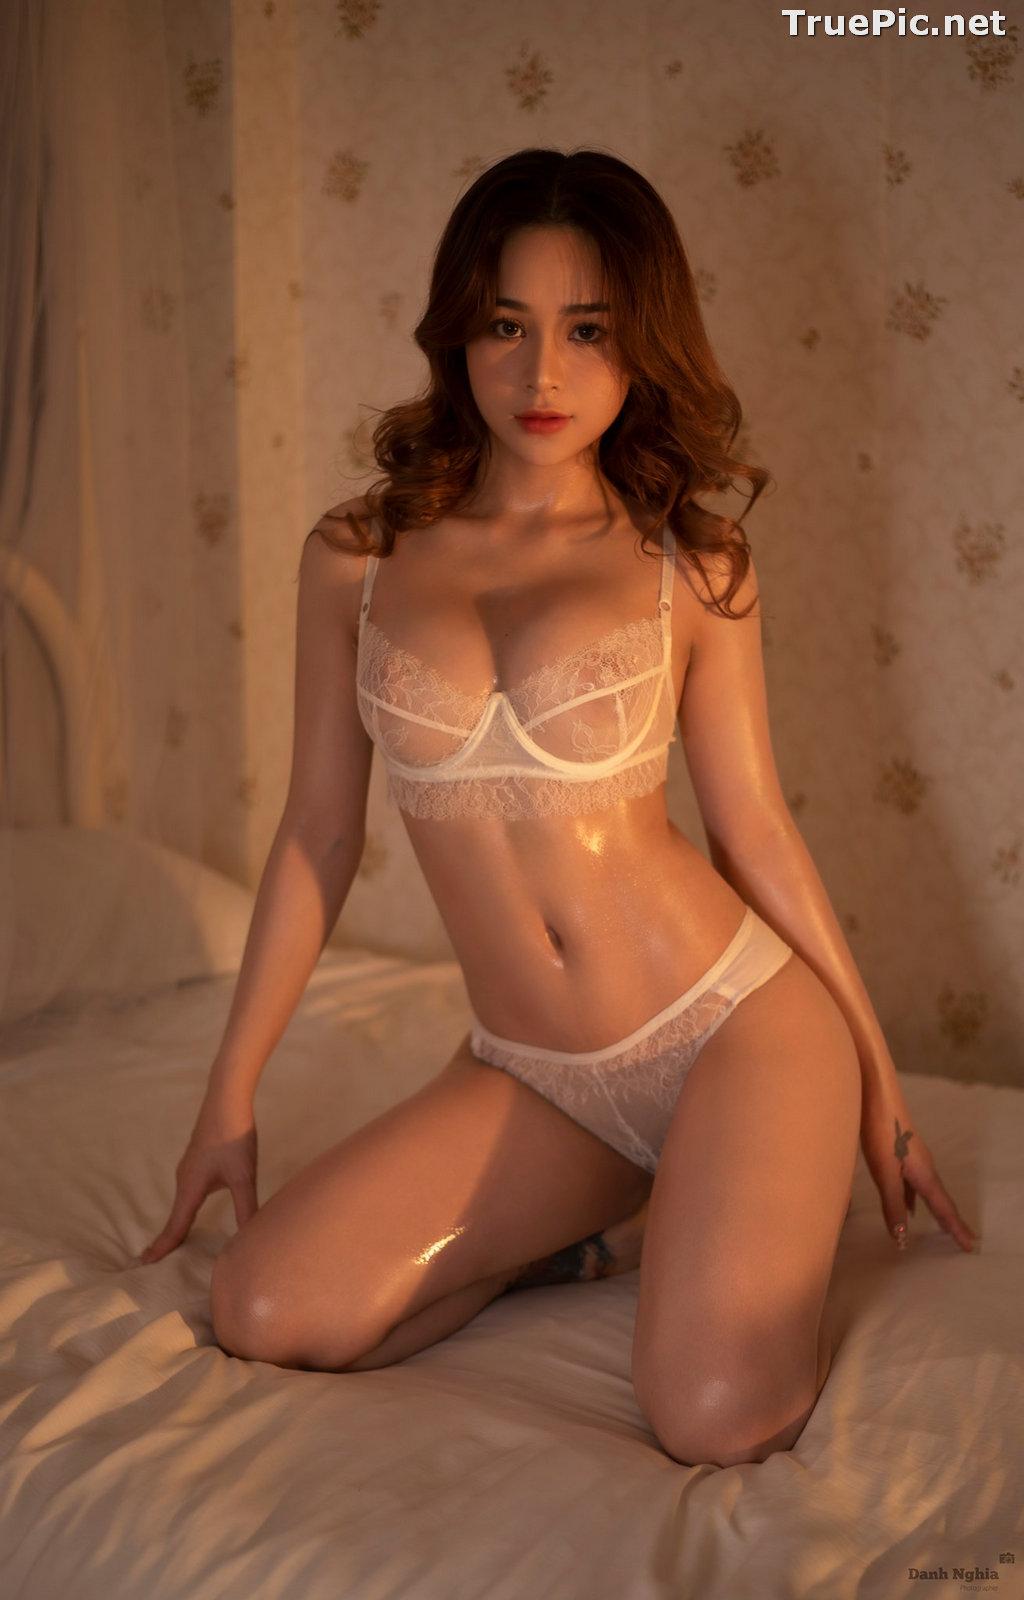 Image Vietnamese Sexy Model - Trinh Phuoc Hien - Concept Massage Oil - TruePic.net - Picture-1